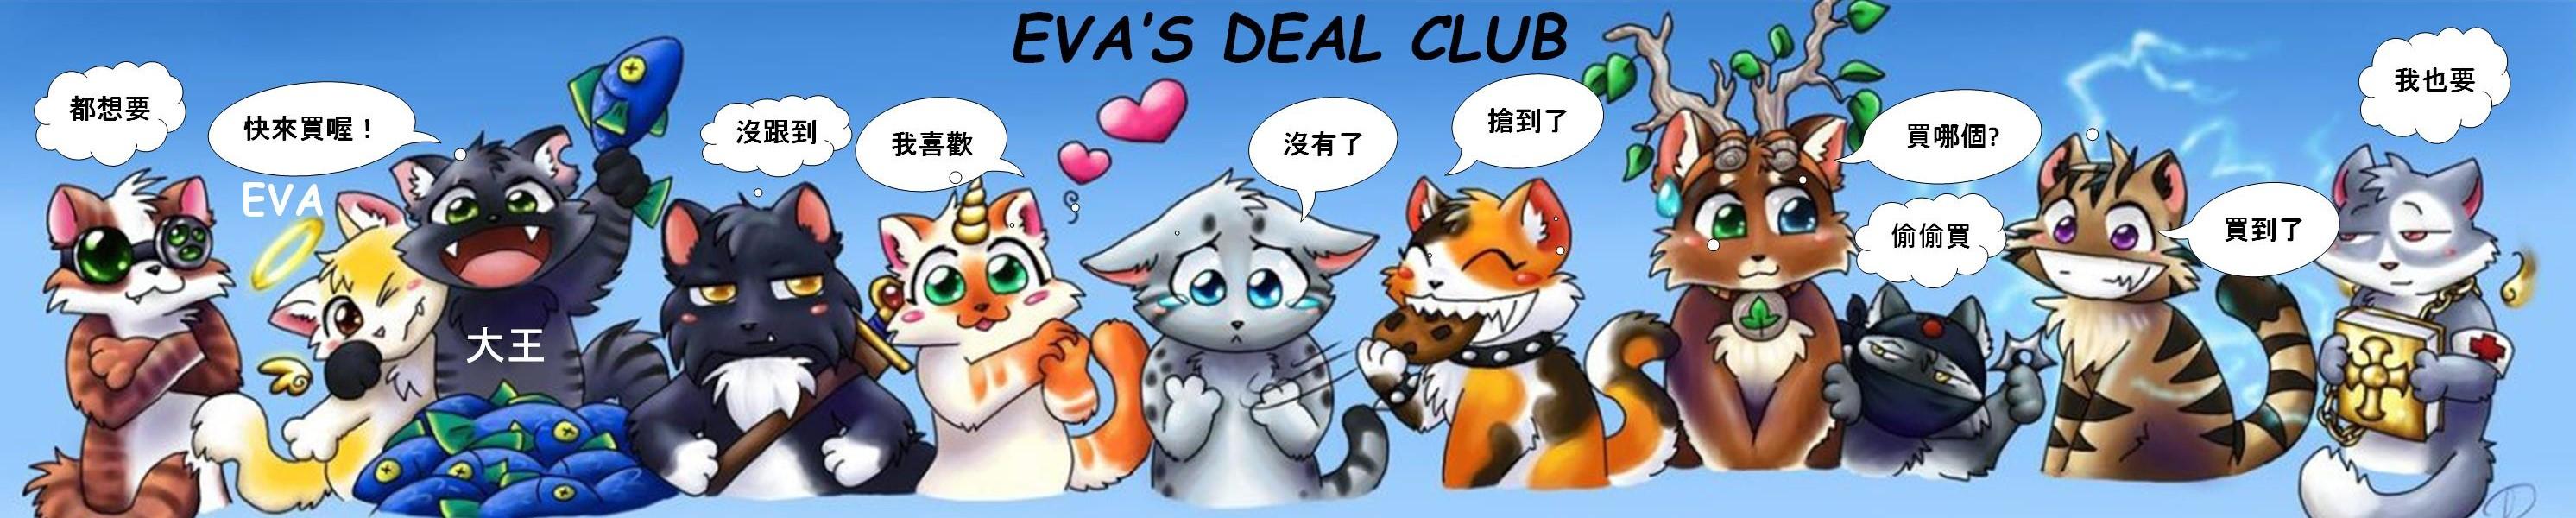 Eva's Deal Club